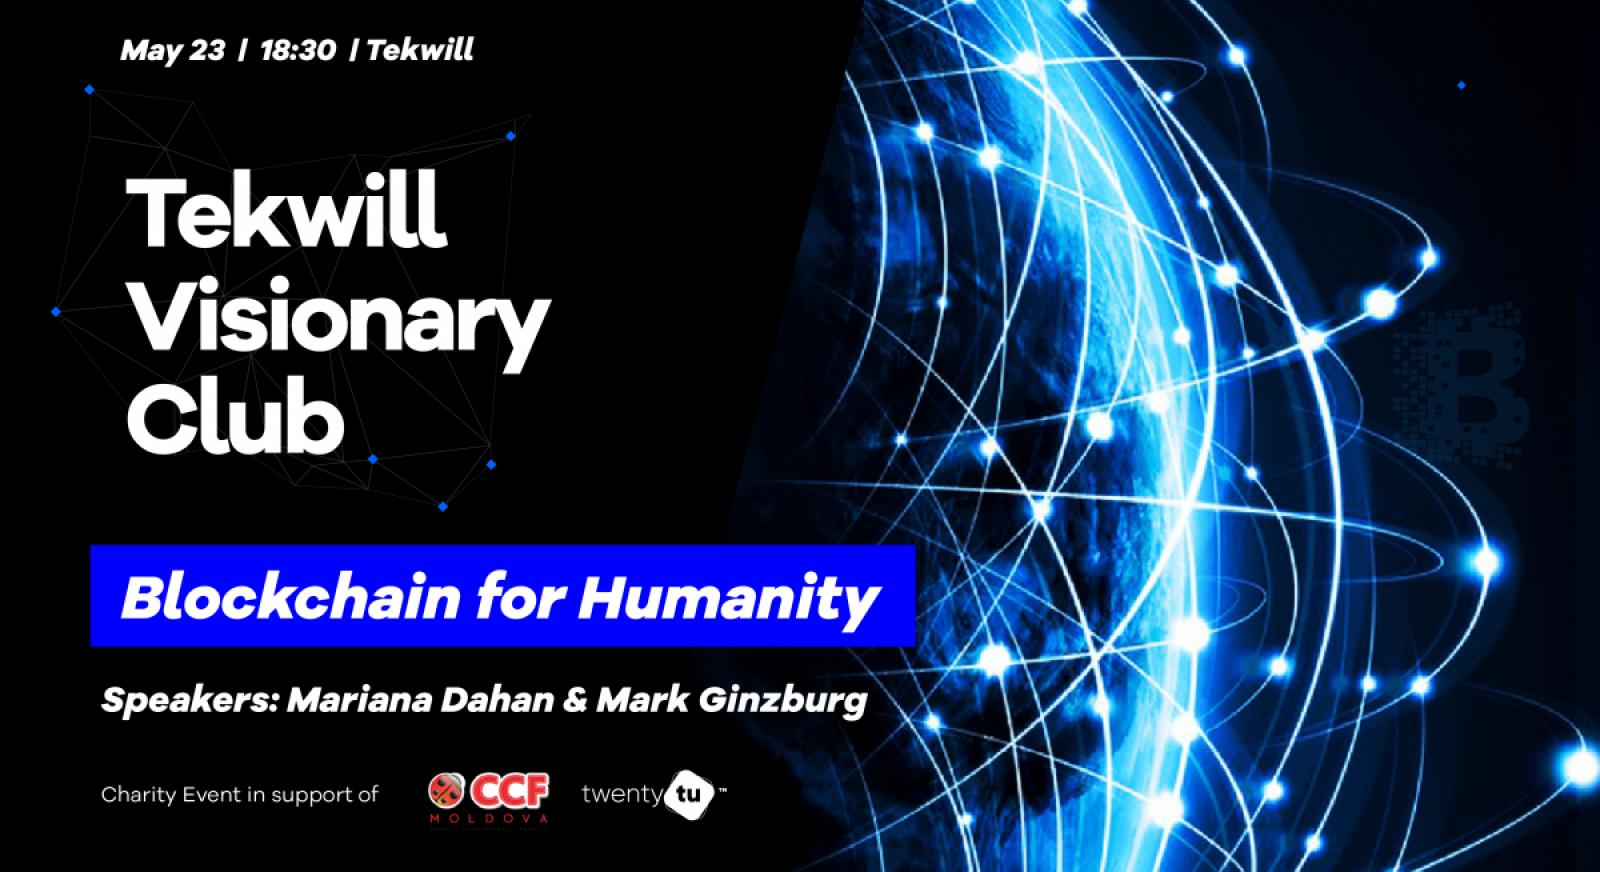 Tekwill Visionary Club cu Mariana Dahan și Mark Ginzburg, experți notorii în domeniul tehnologiei Blockchain